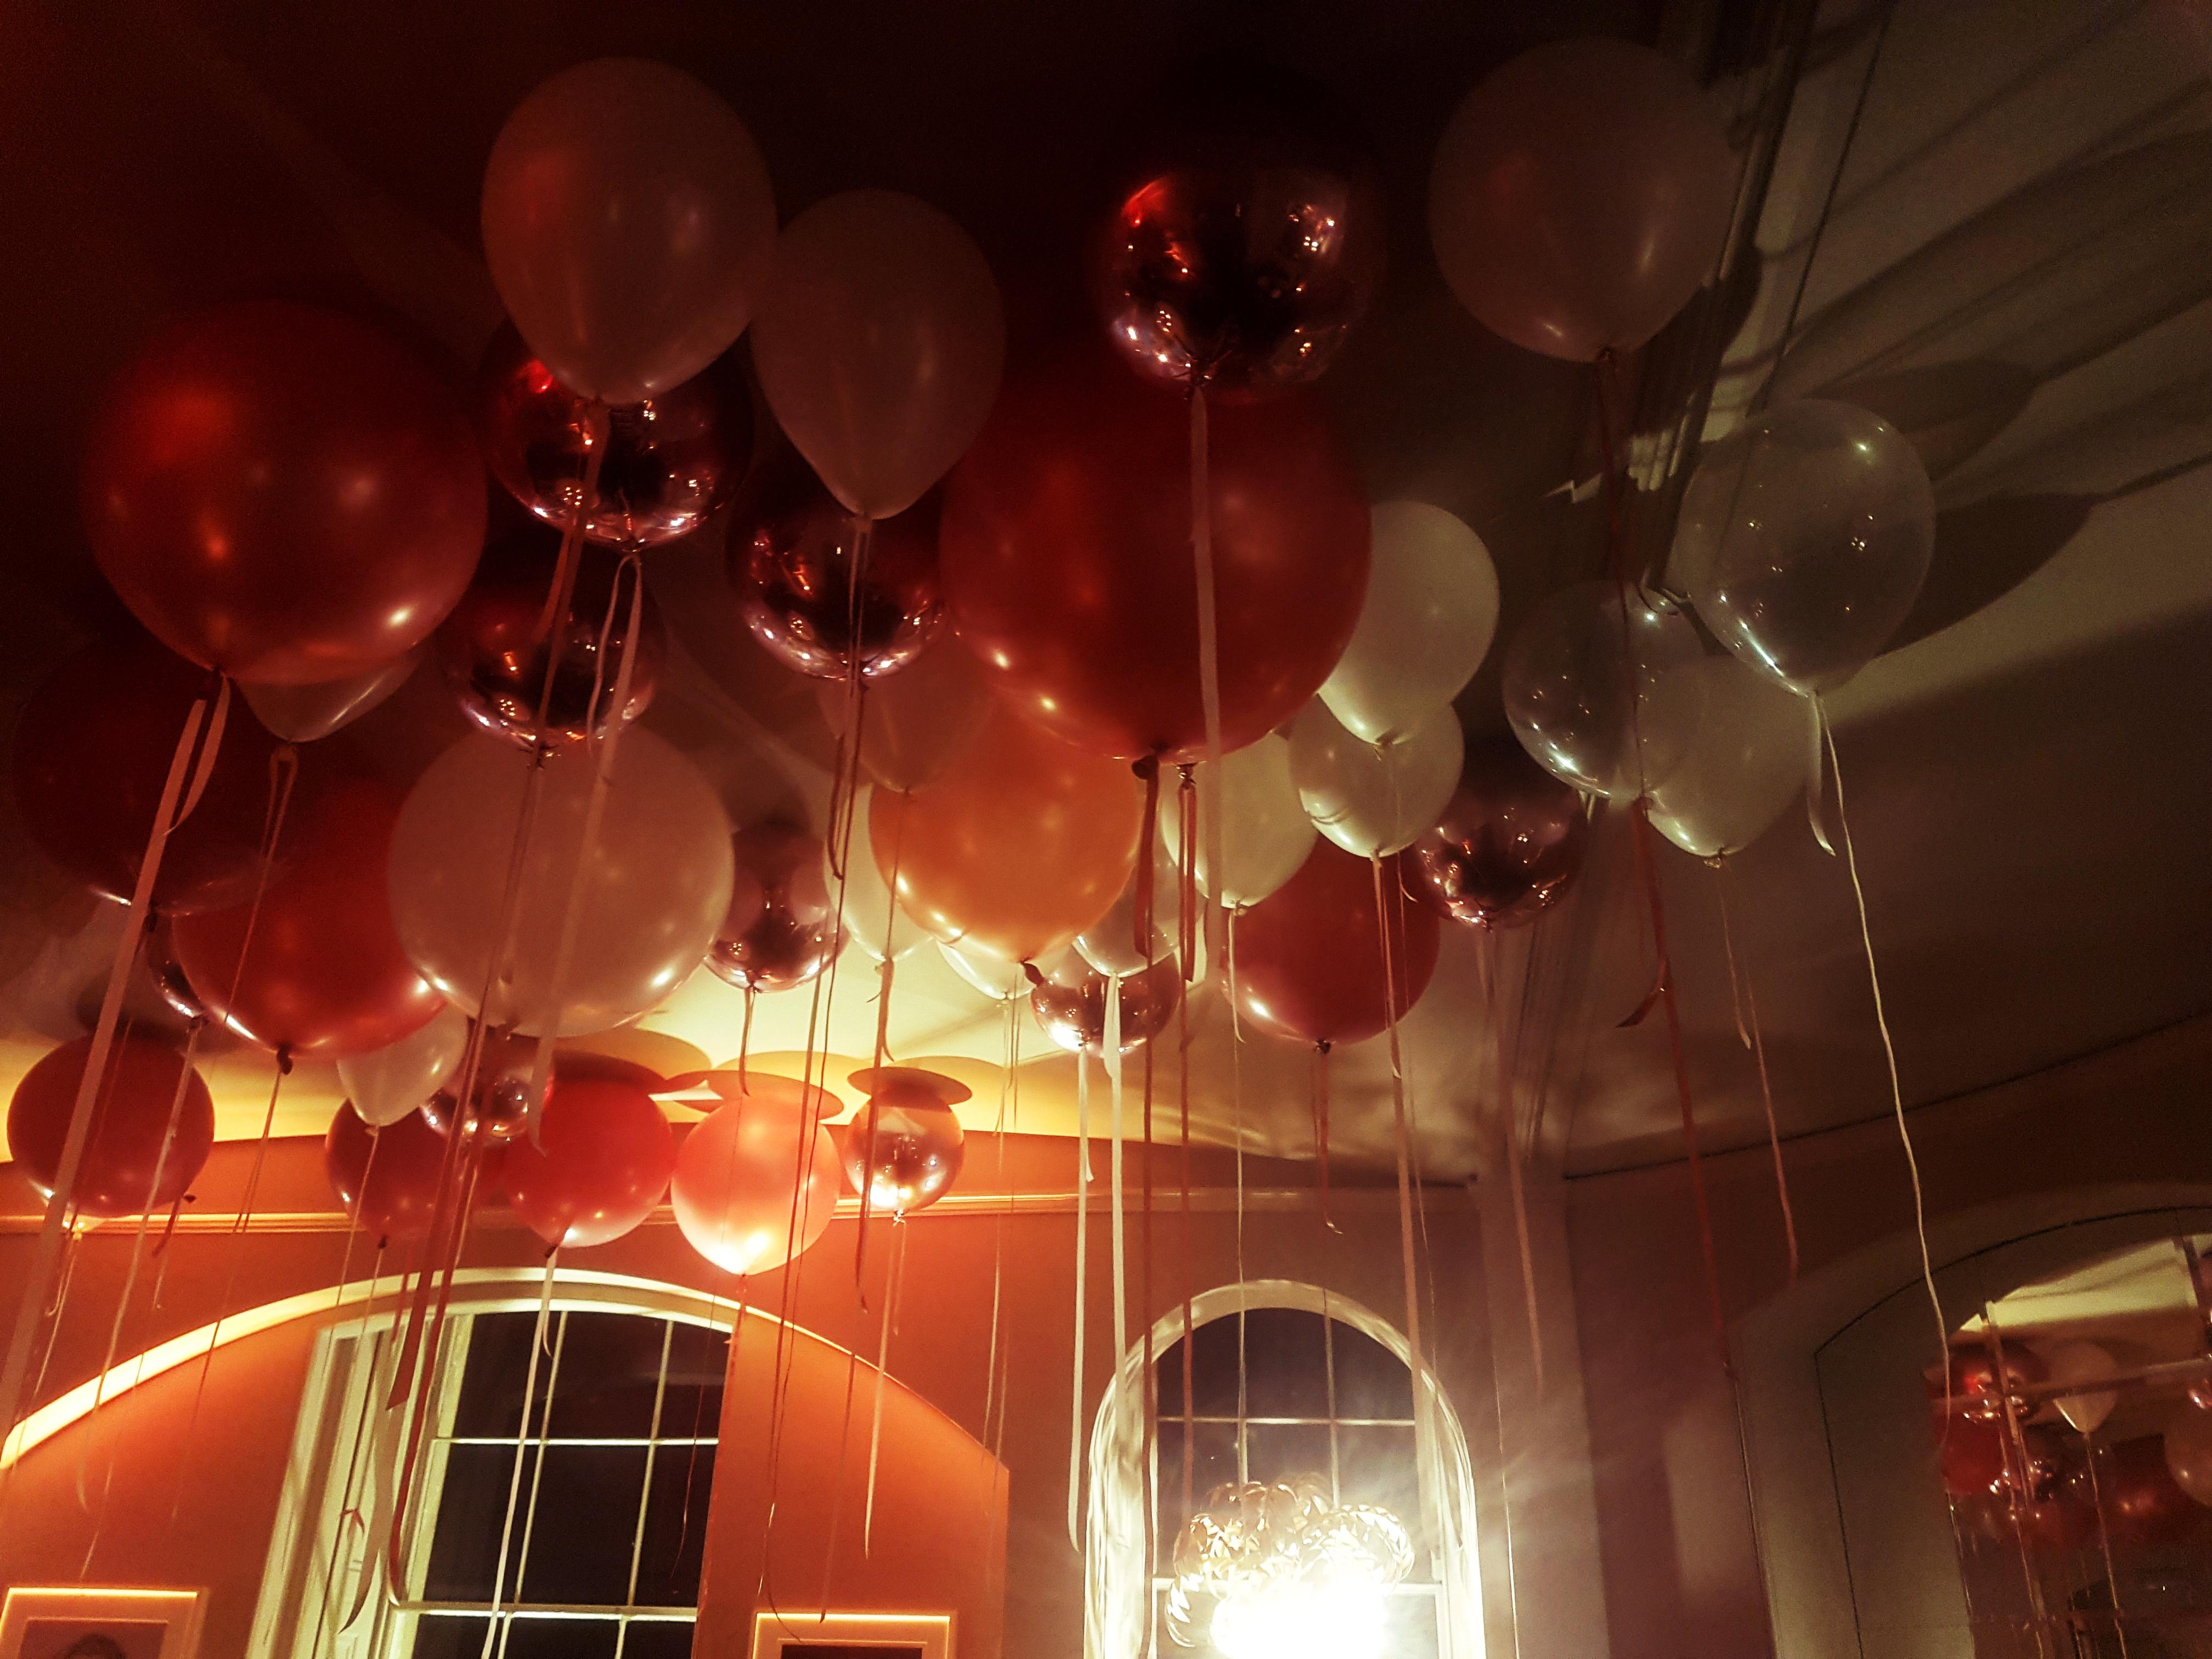 Wedding Balloons Aynhoe Park Oxfordshire